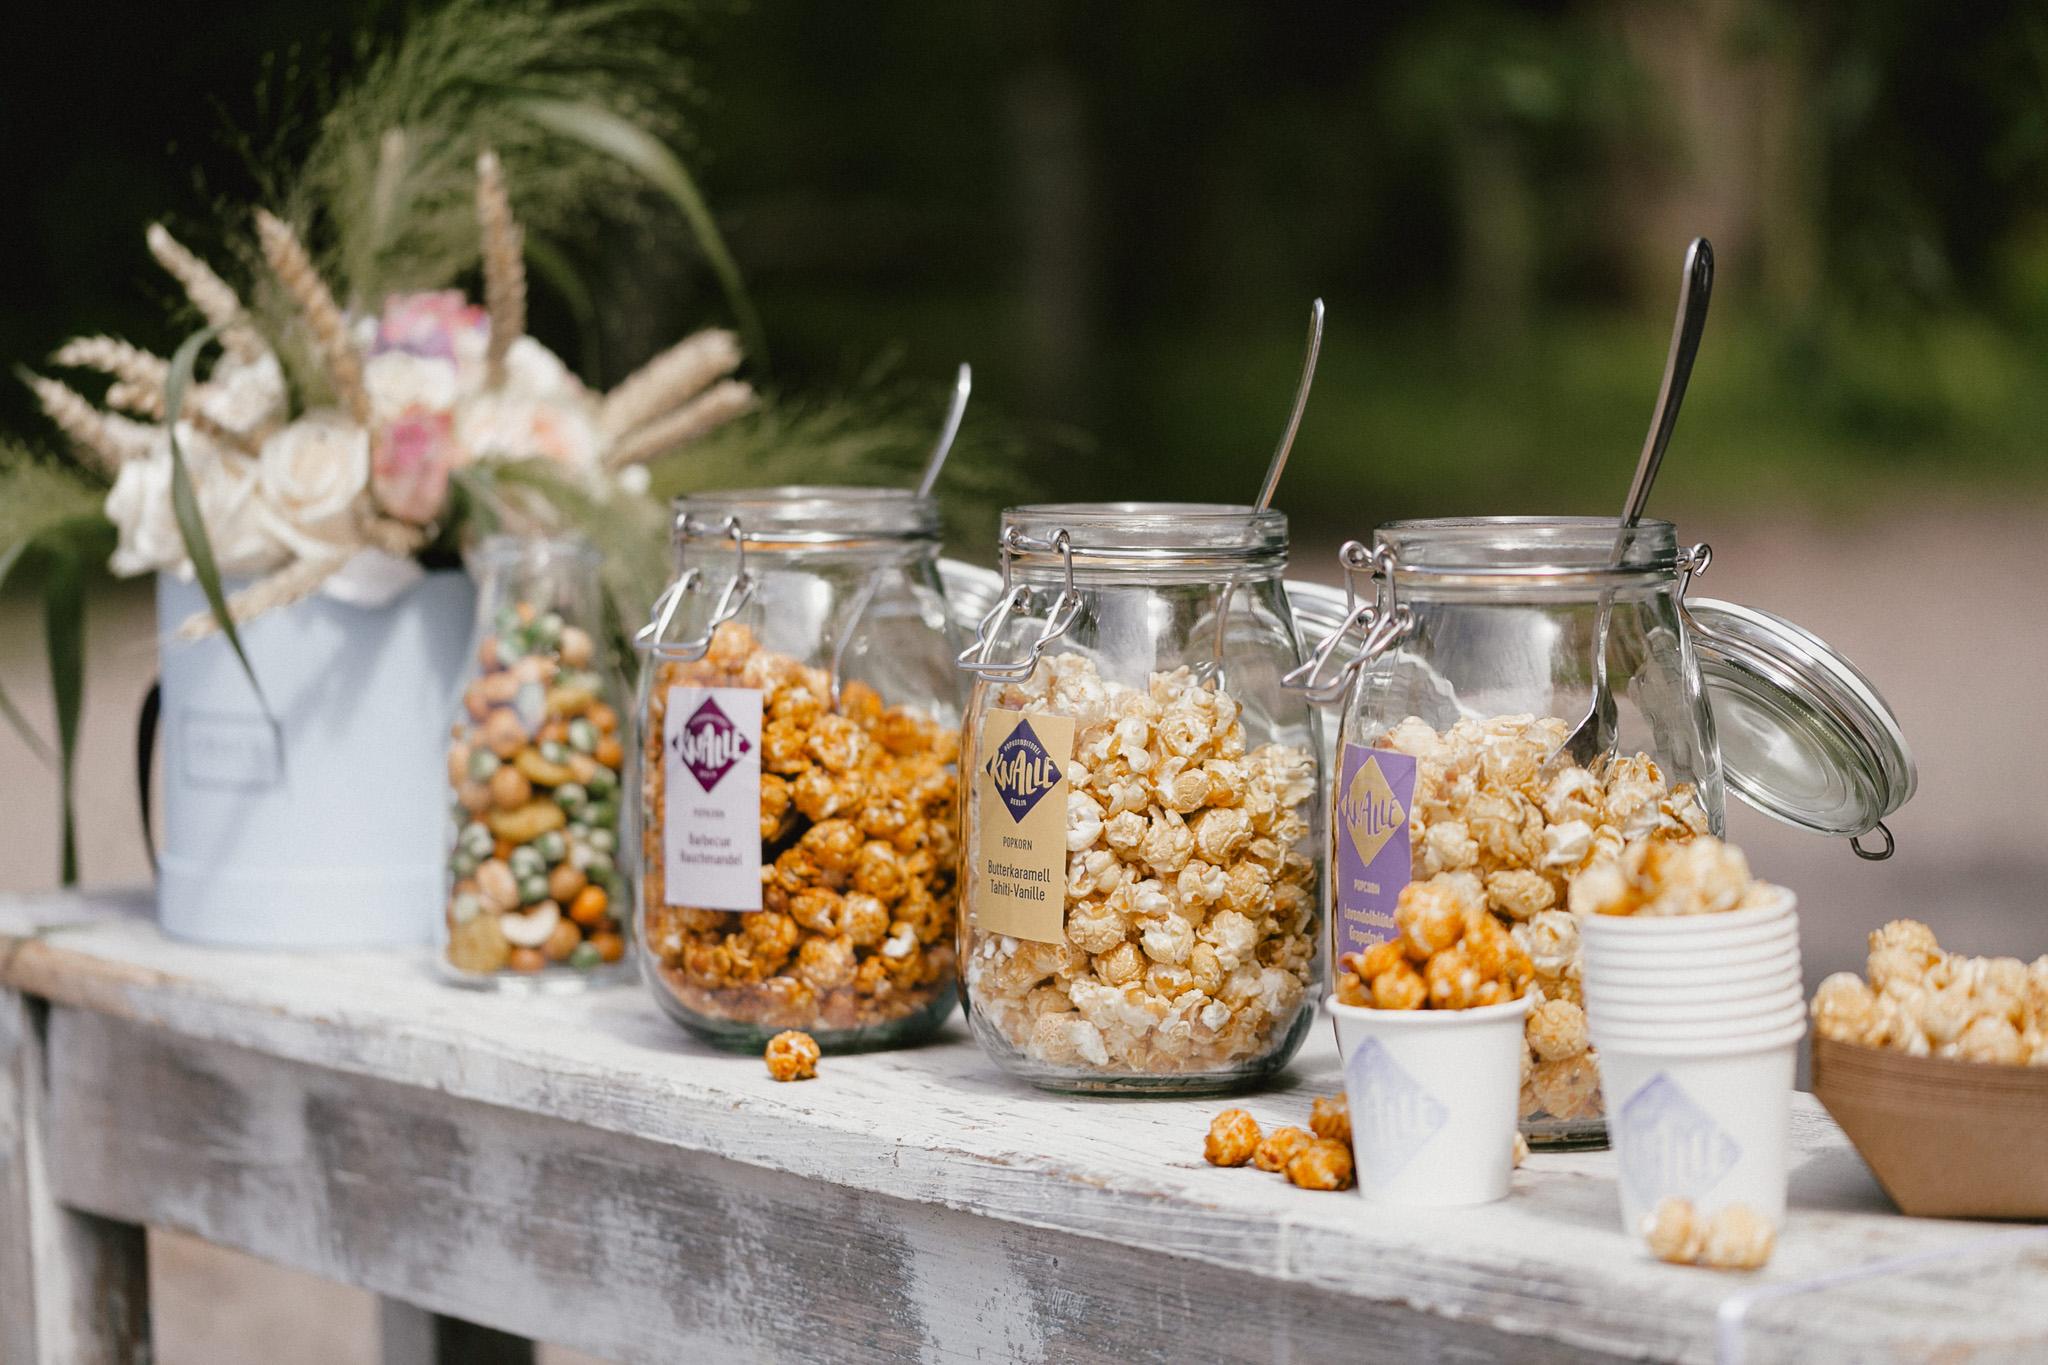 Popcorn Hochzeit - Popcorn bar statt Sweet Table